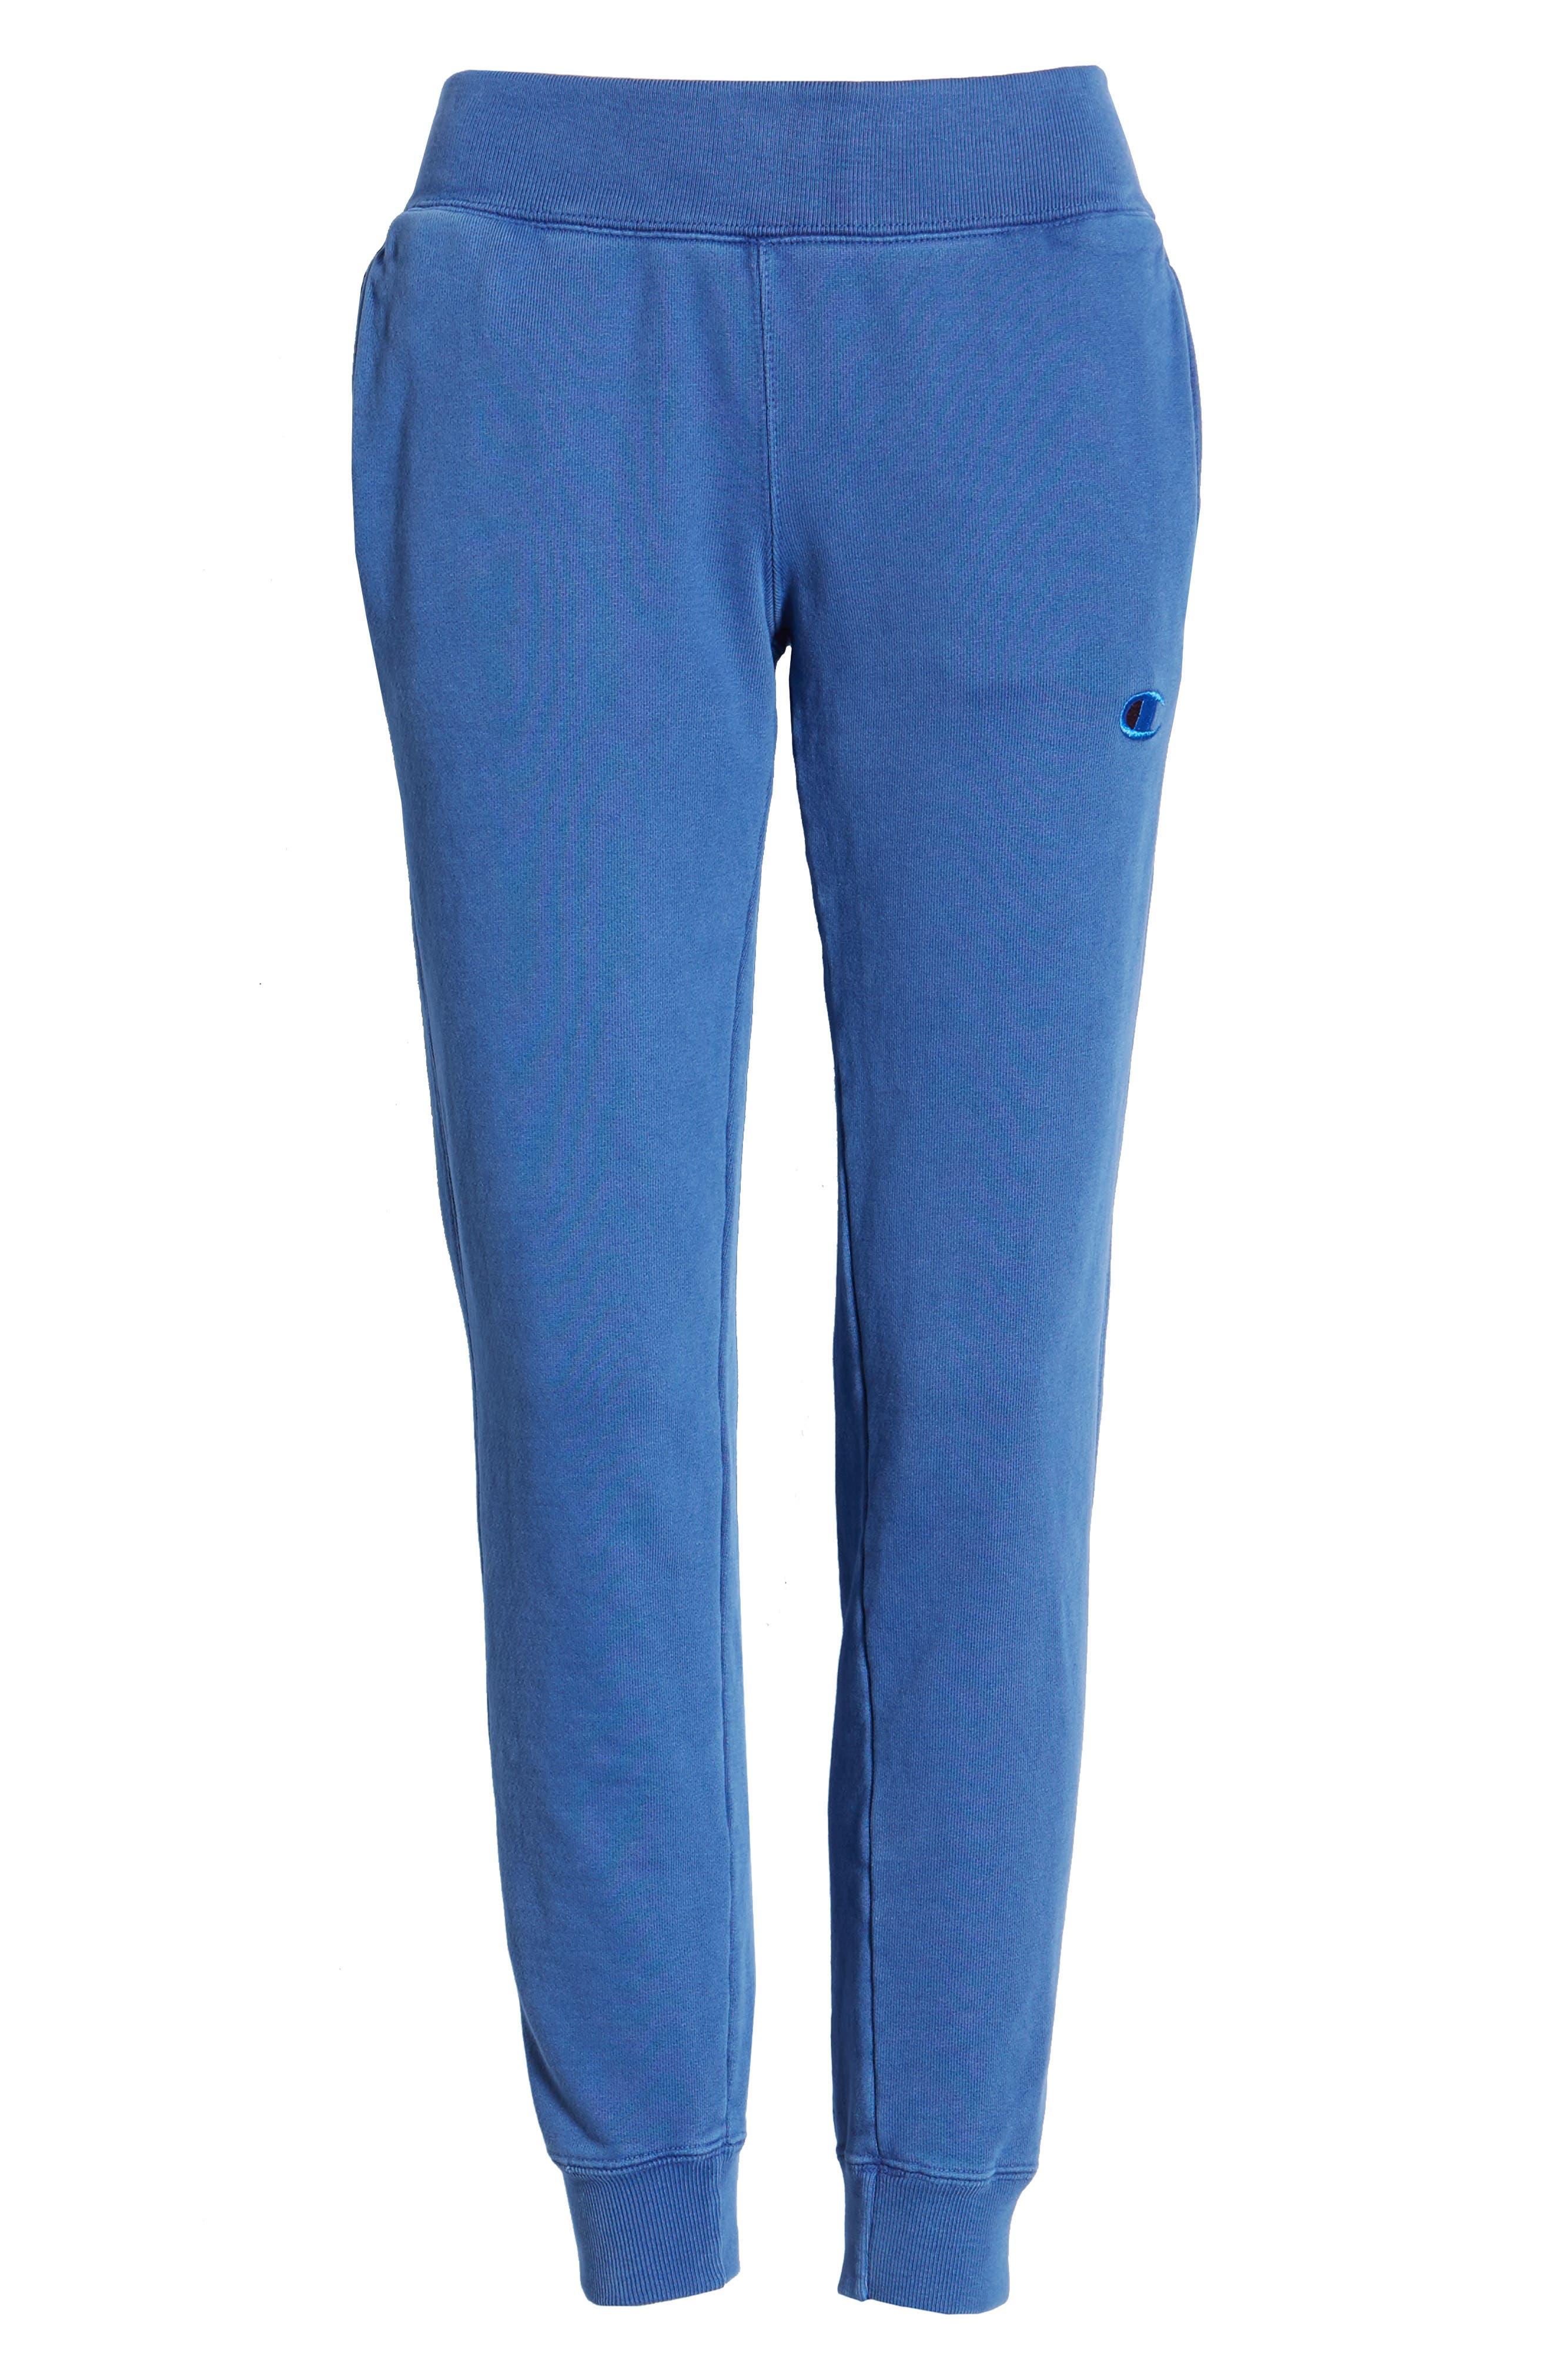 CHAMPION, Garment Dyed Jogger Pants, Alternate thumbnail 7, color, 400